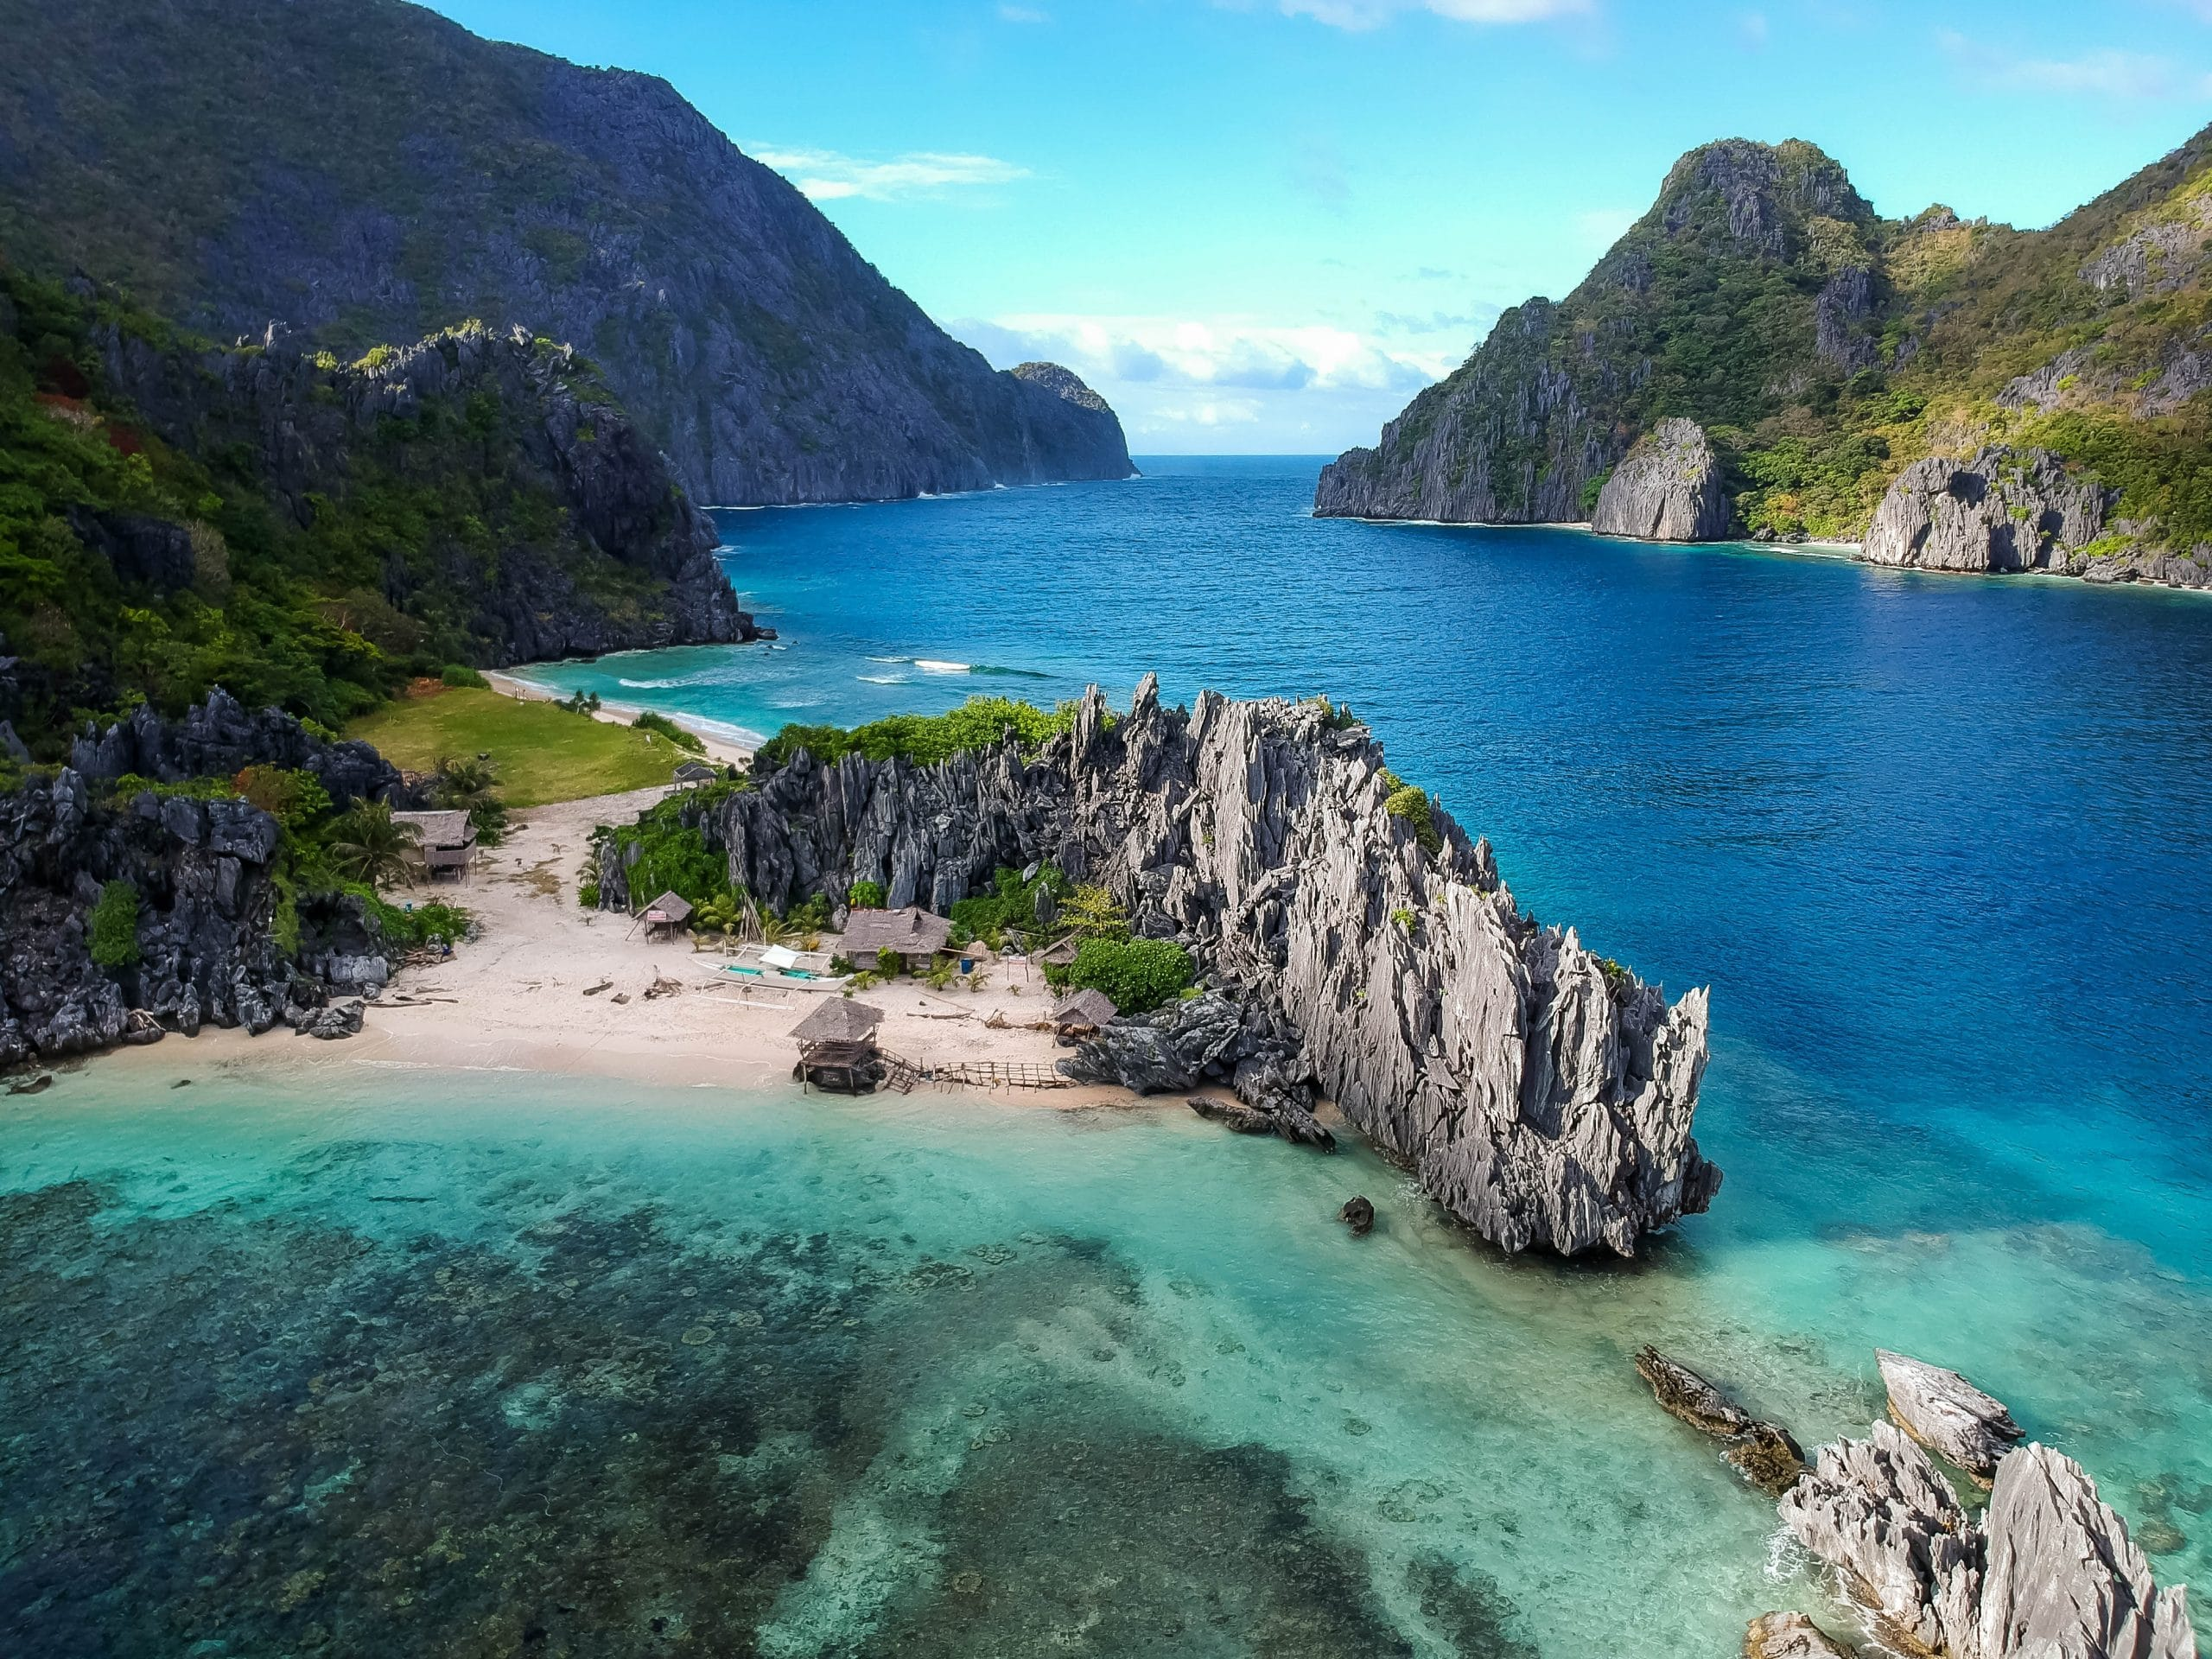 philippines-landscape-southeast-asia-ocean